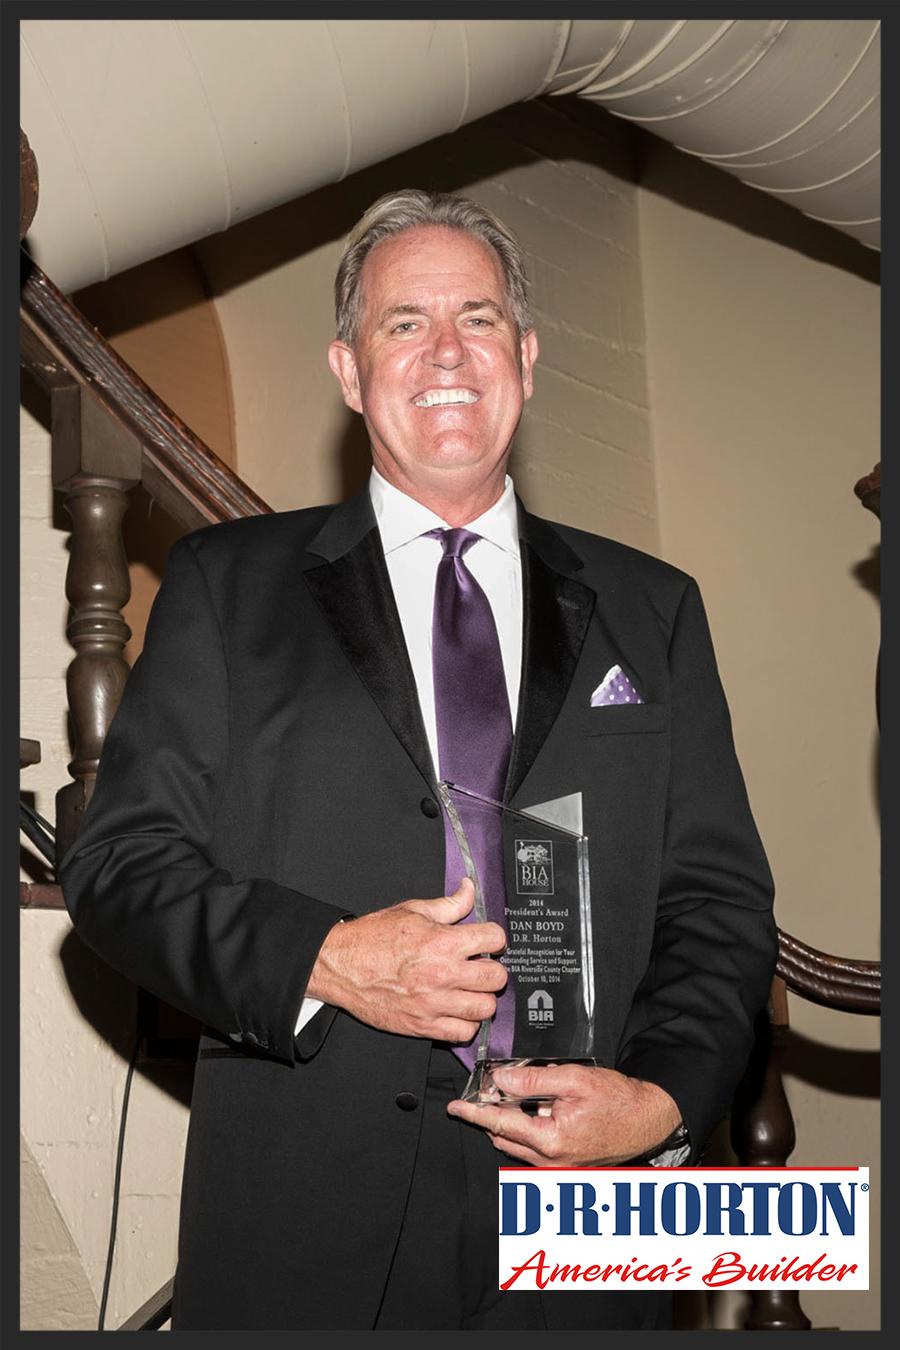 Dan Boyd of D.R. Horton accepting President's Award